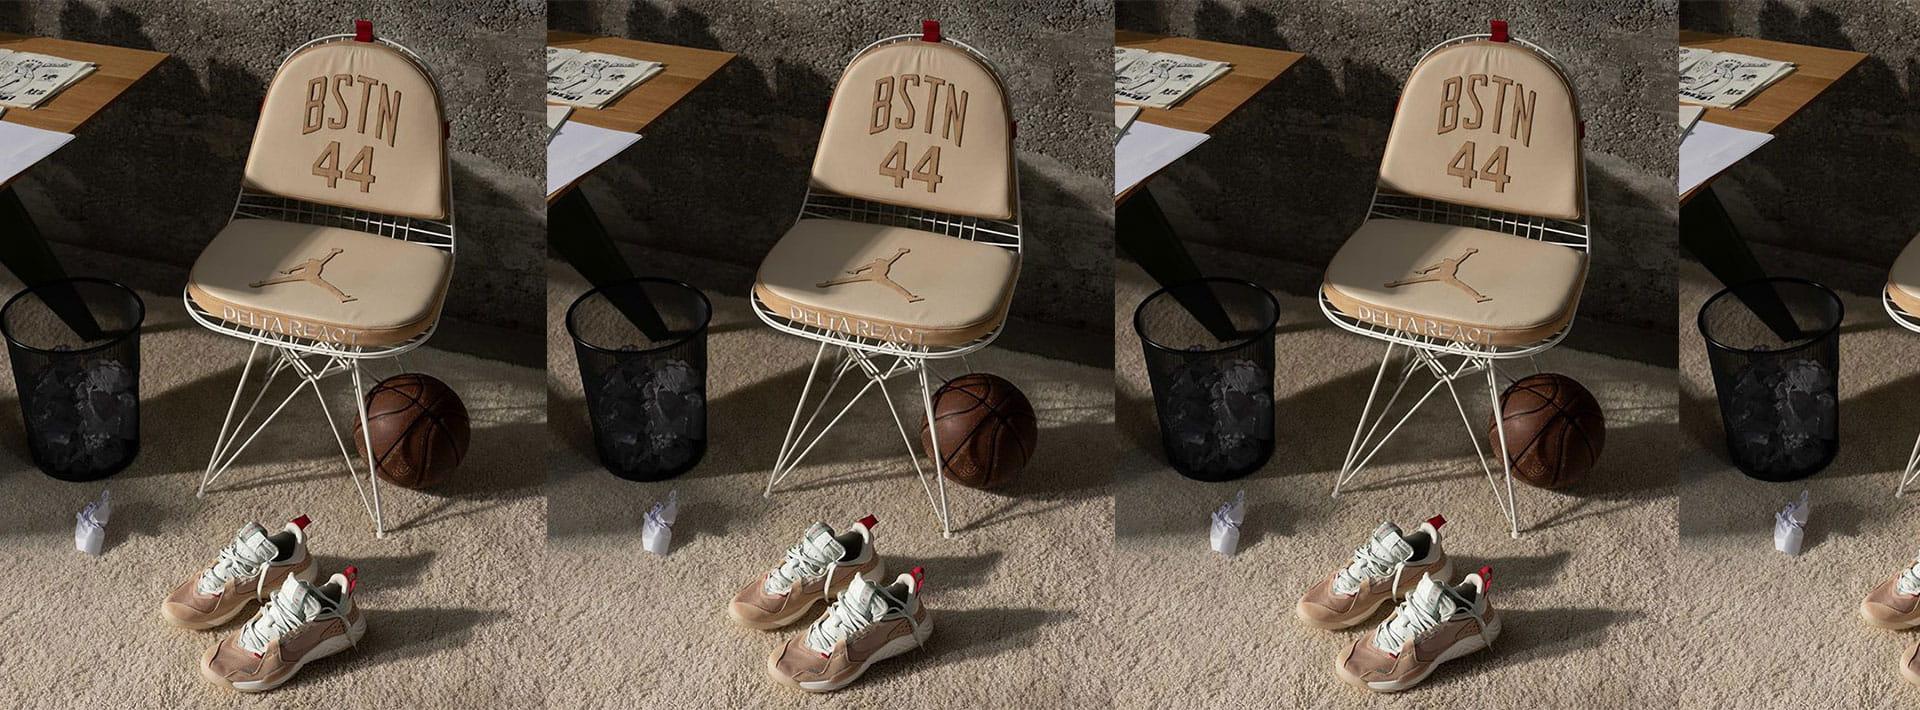 The custom-built Jordan Chair designed by BSTN alongside the new Jordan Delta React is def a next-level release.